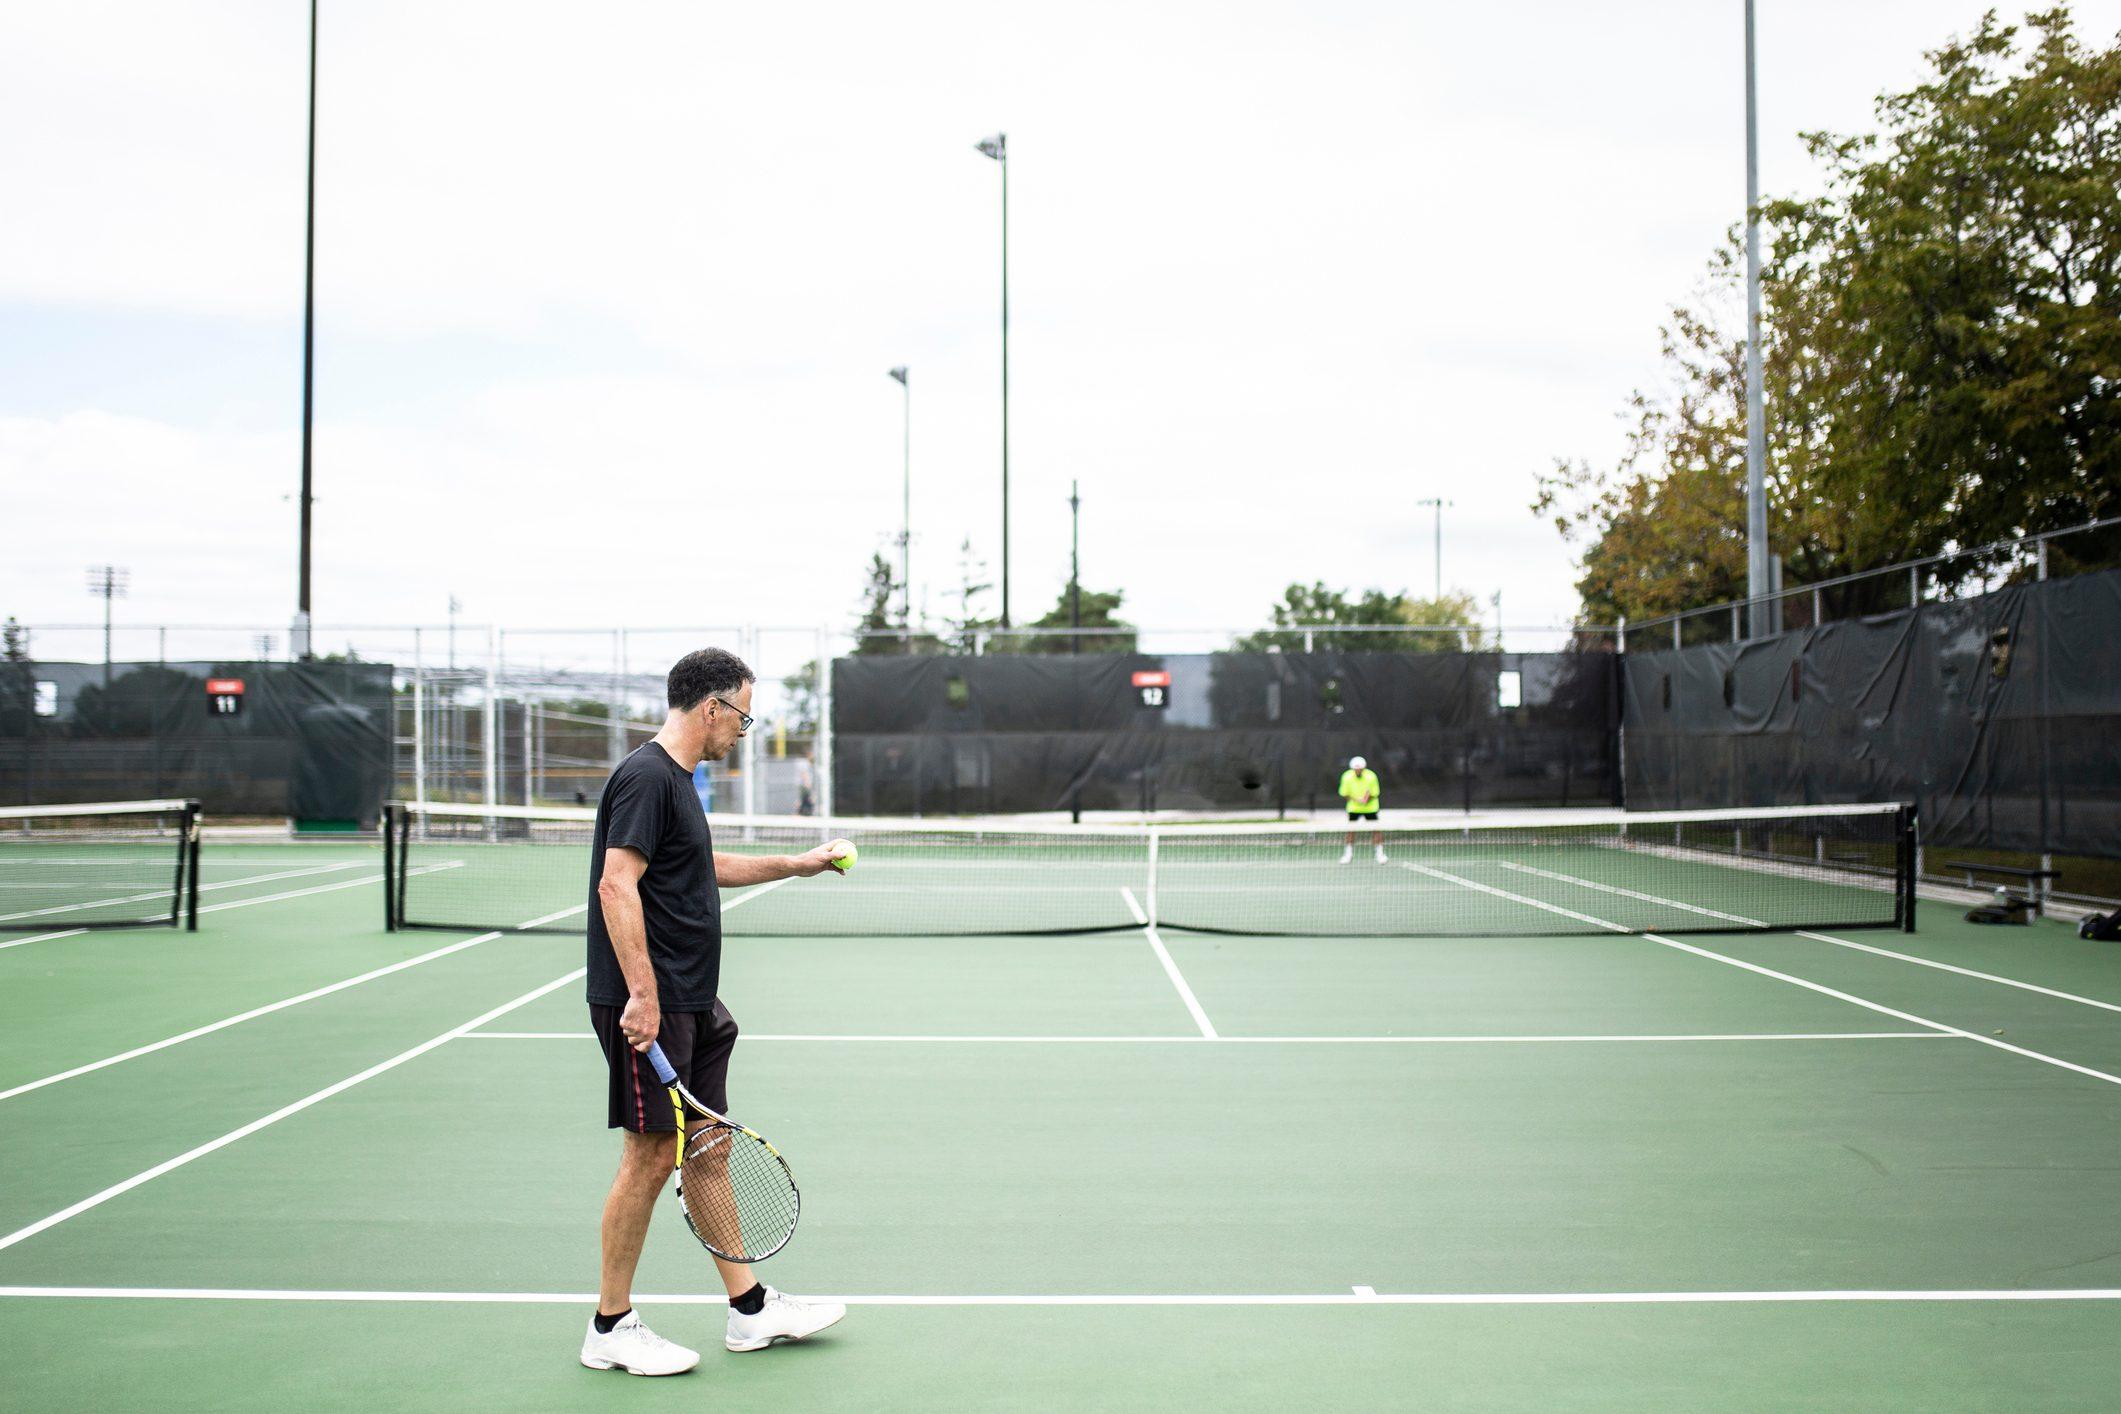 man playing tennis outside